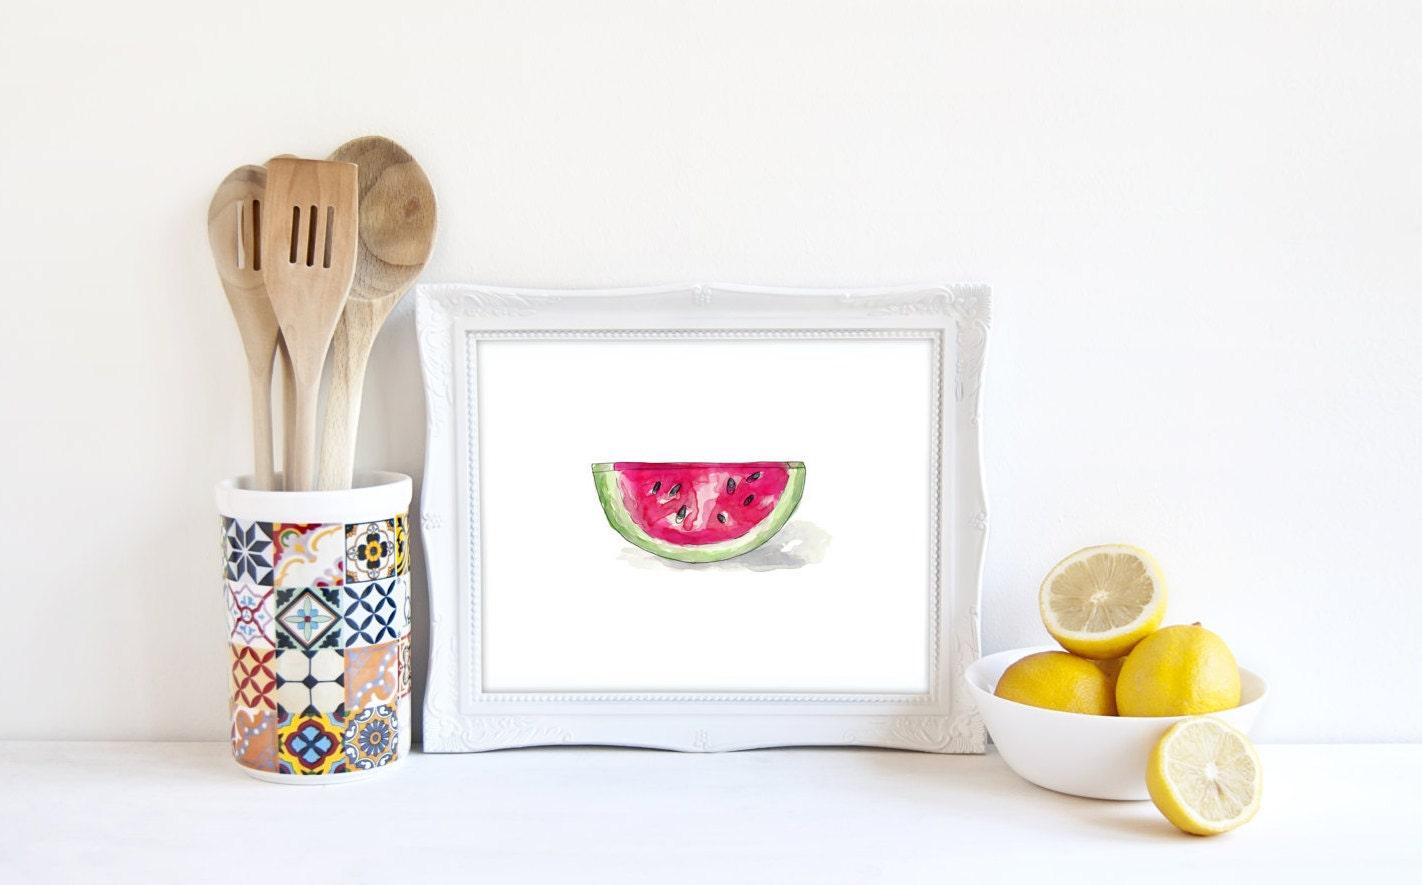 watermelon print watermelon decor food kitchen